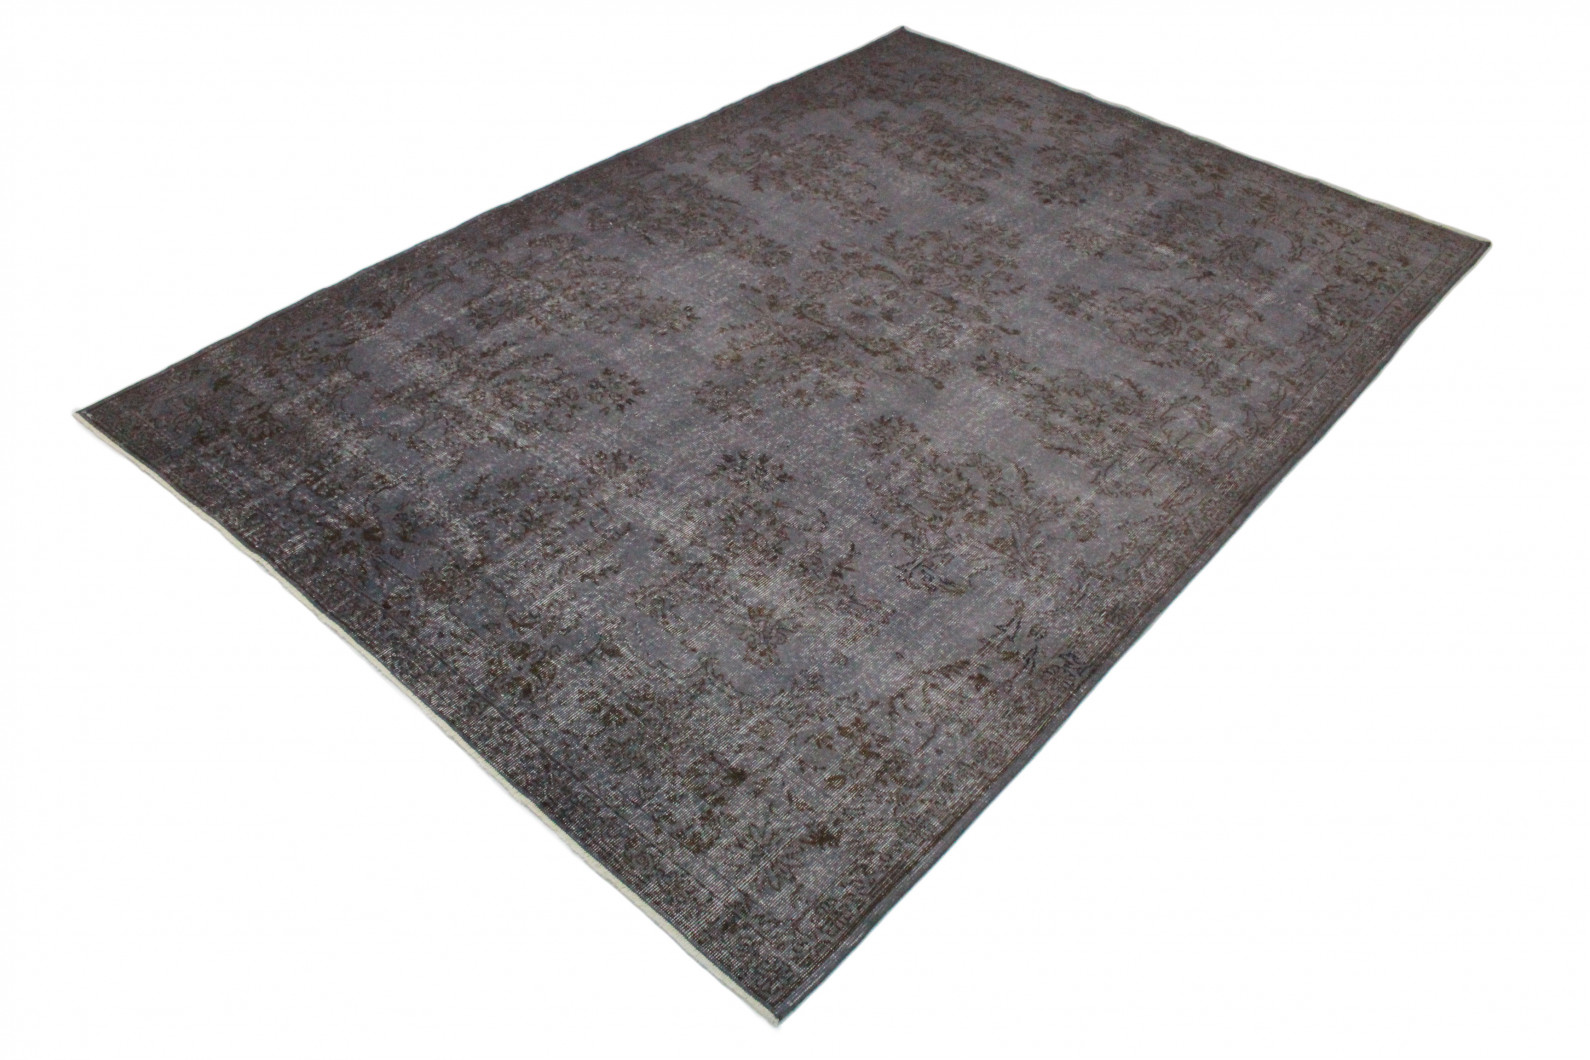 Teppich grau lila  Vintage Teppich Grau Lila in 320x220 (1011-5177) bei carpetido.de ...